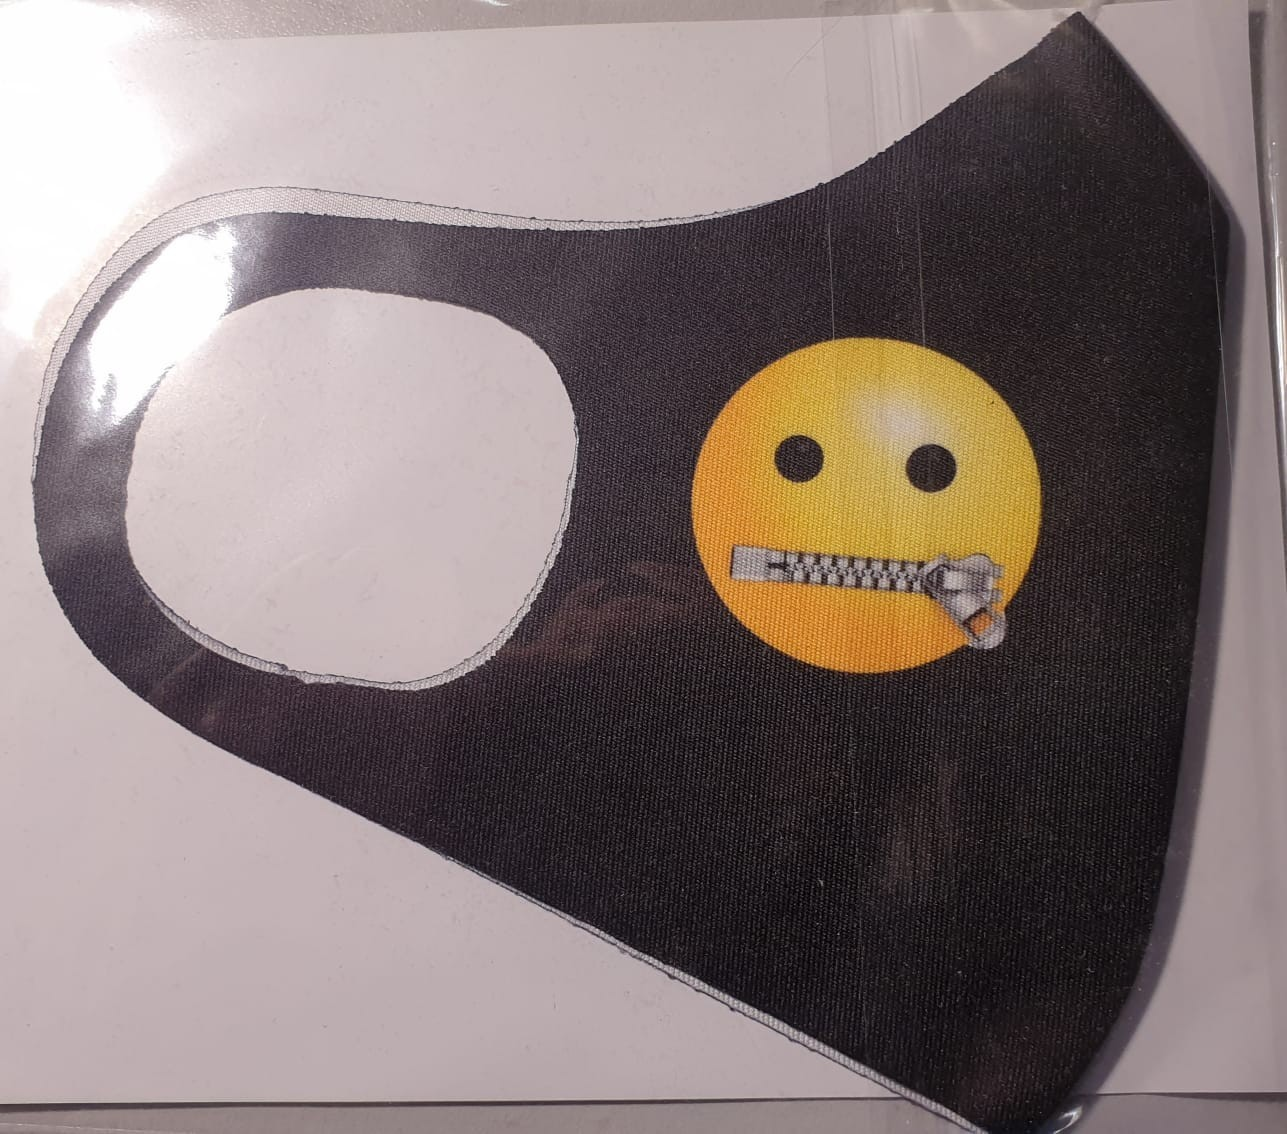 Masca protectie Emoji fermoar la gura, Reutilizabila + cadou imagine techstar.ro 2021